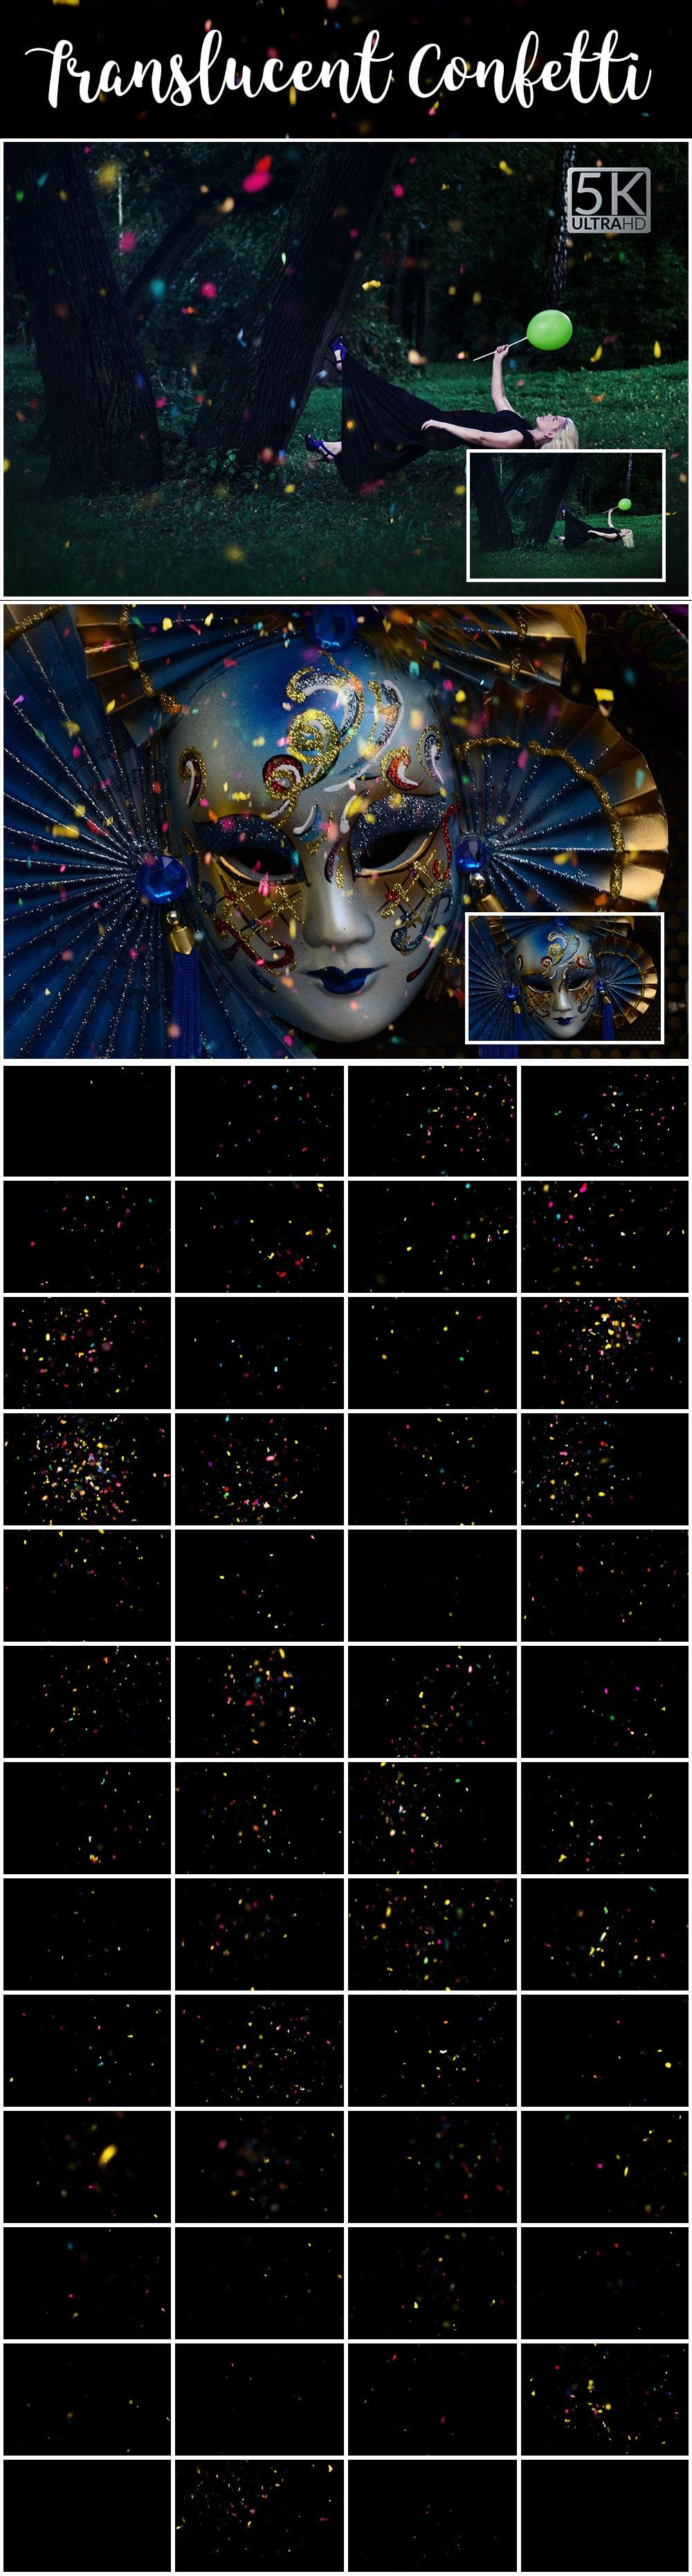 1100 Photoshop Overlays Mega Pack - Extended License - 34 Translucent Confetti